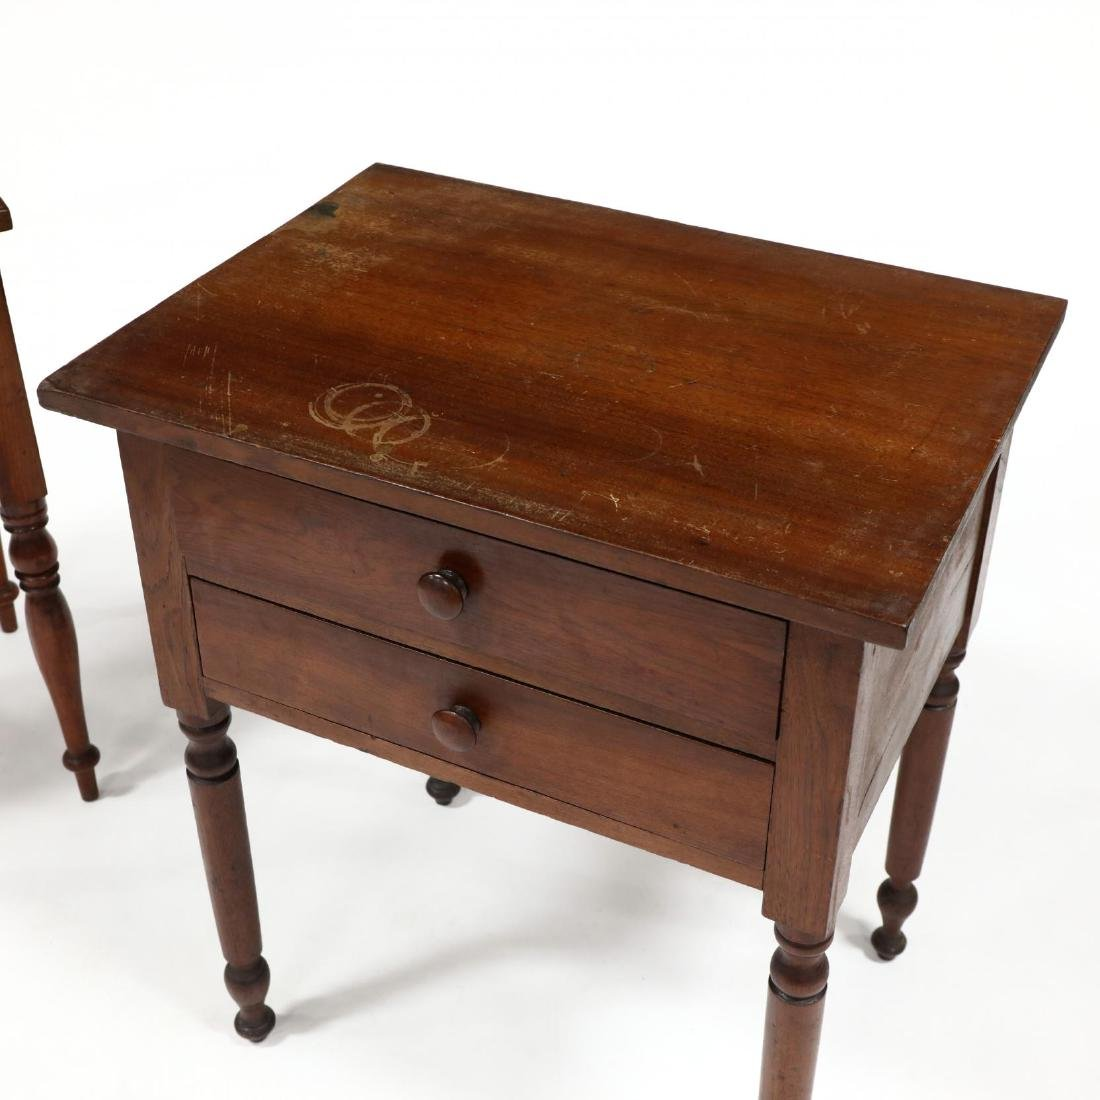 Two Sheraton Walnut Work Tables - 2